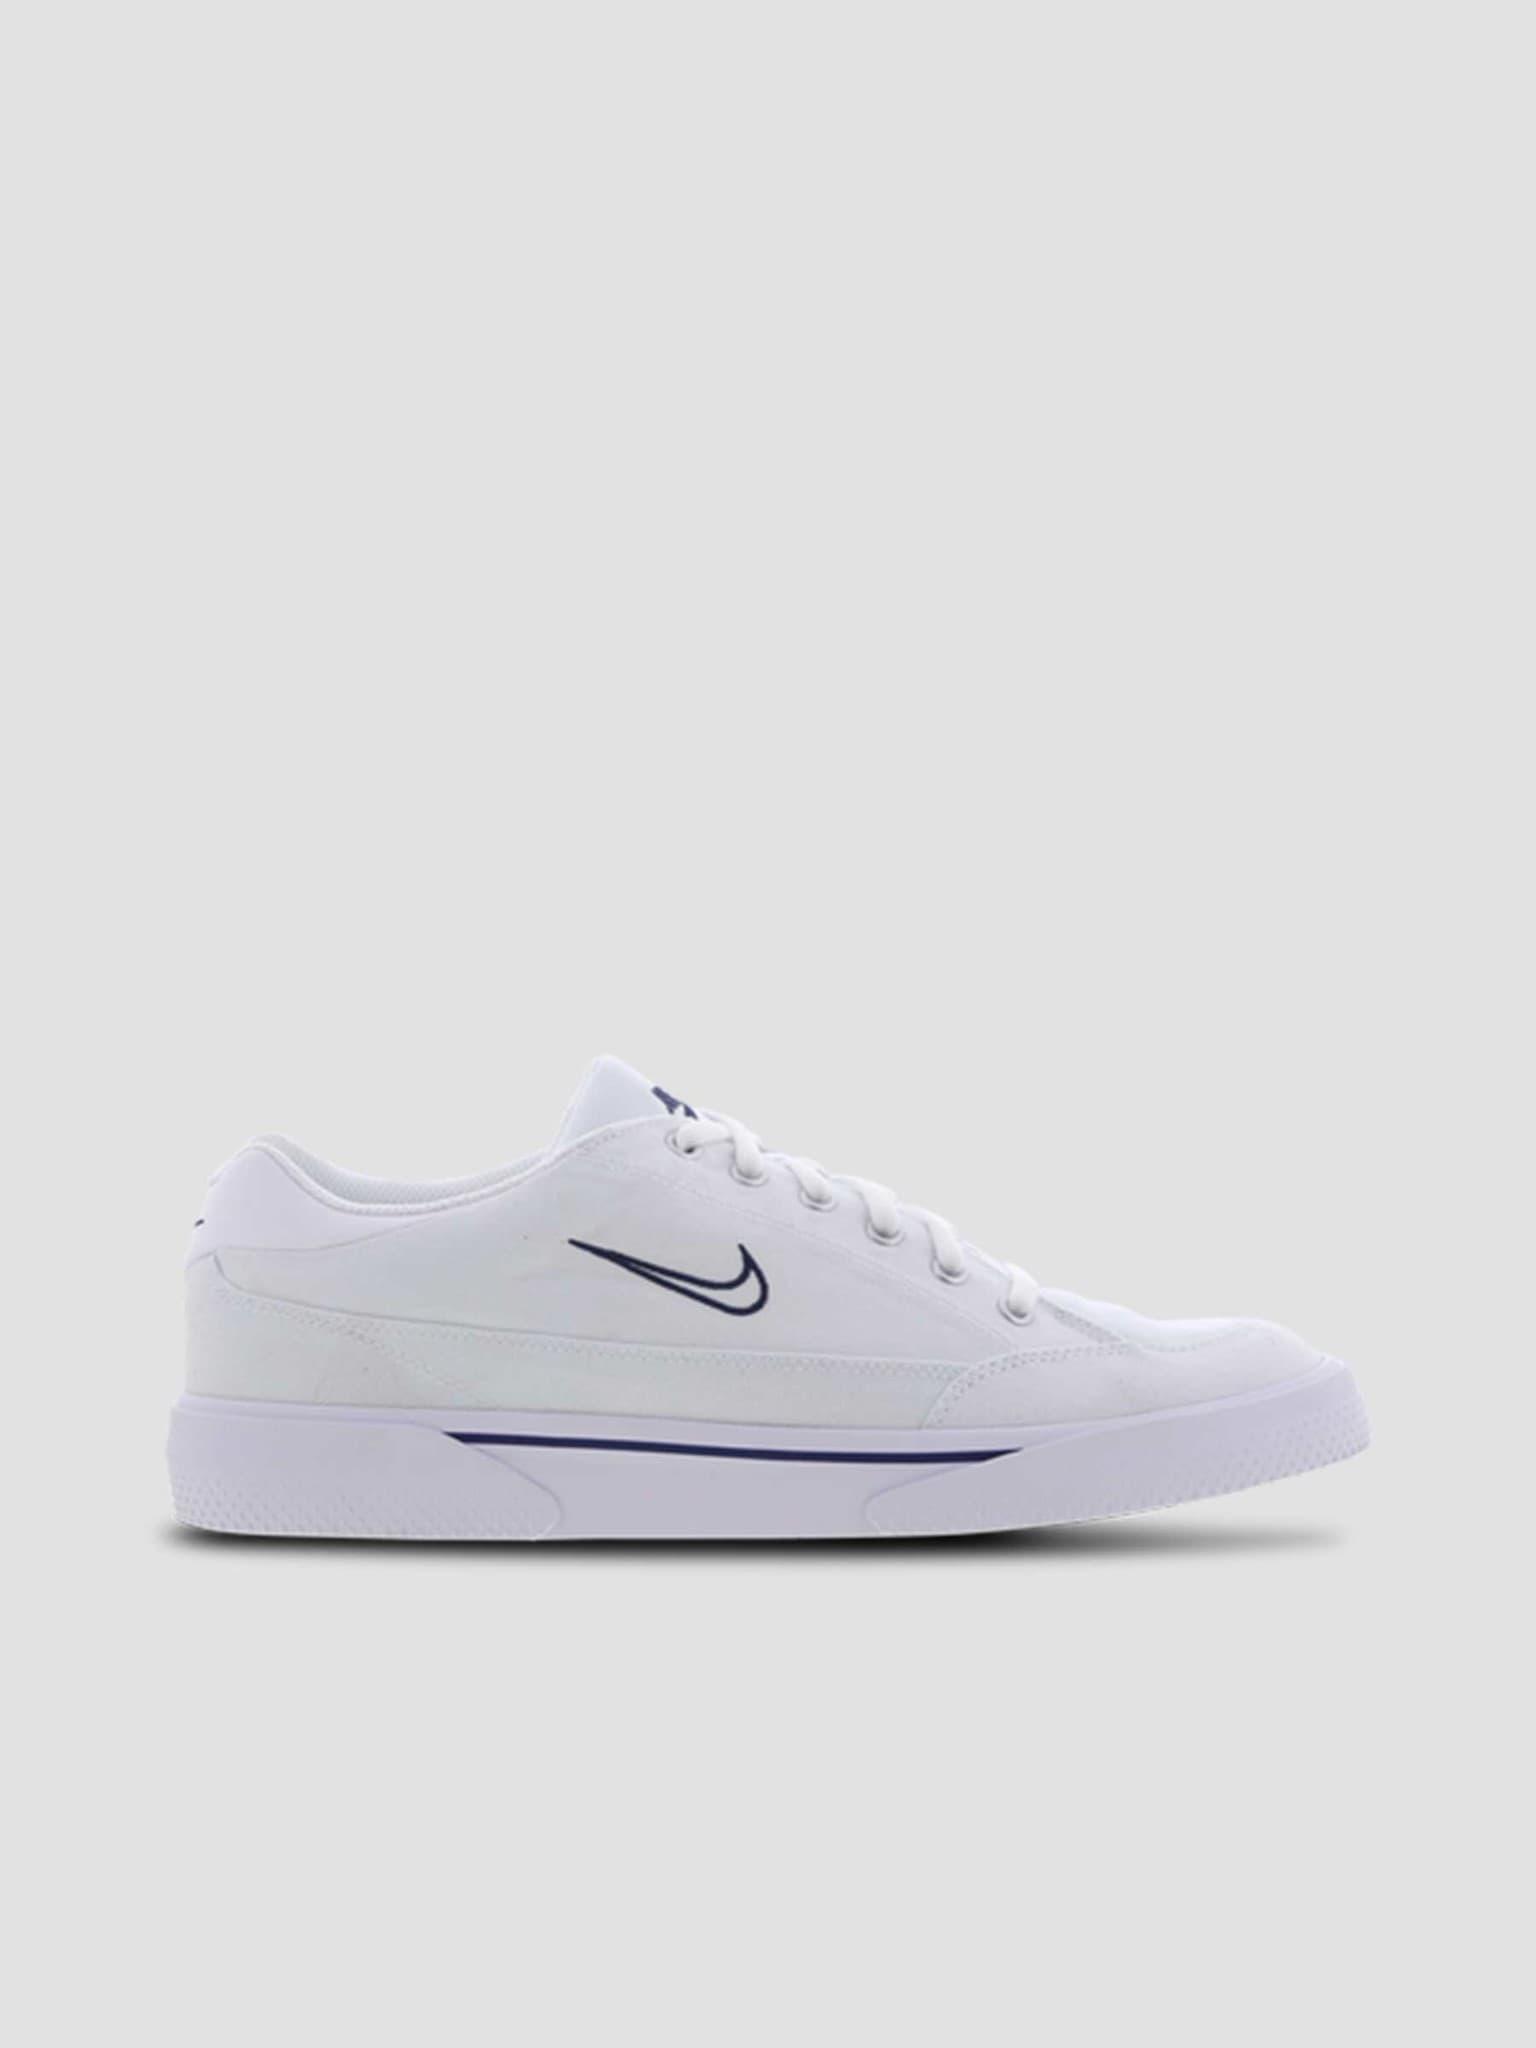 Nike Gts 97 White Midnight Navy Matte Aluminum DA1446-100